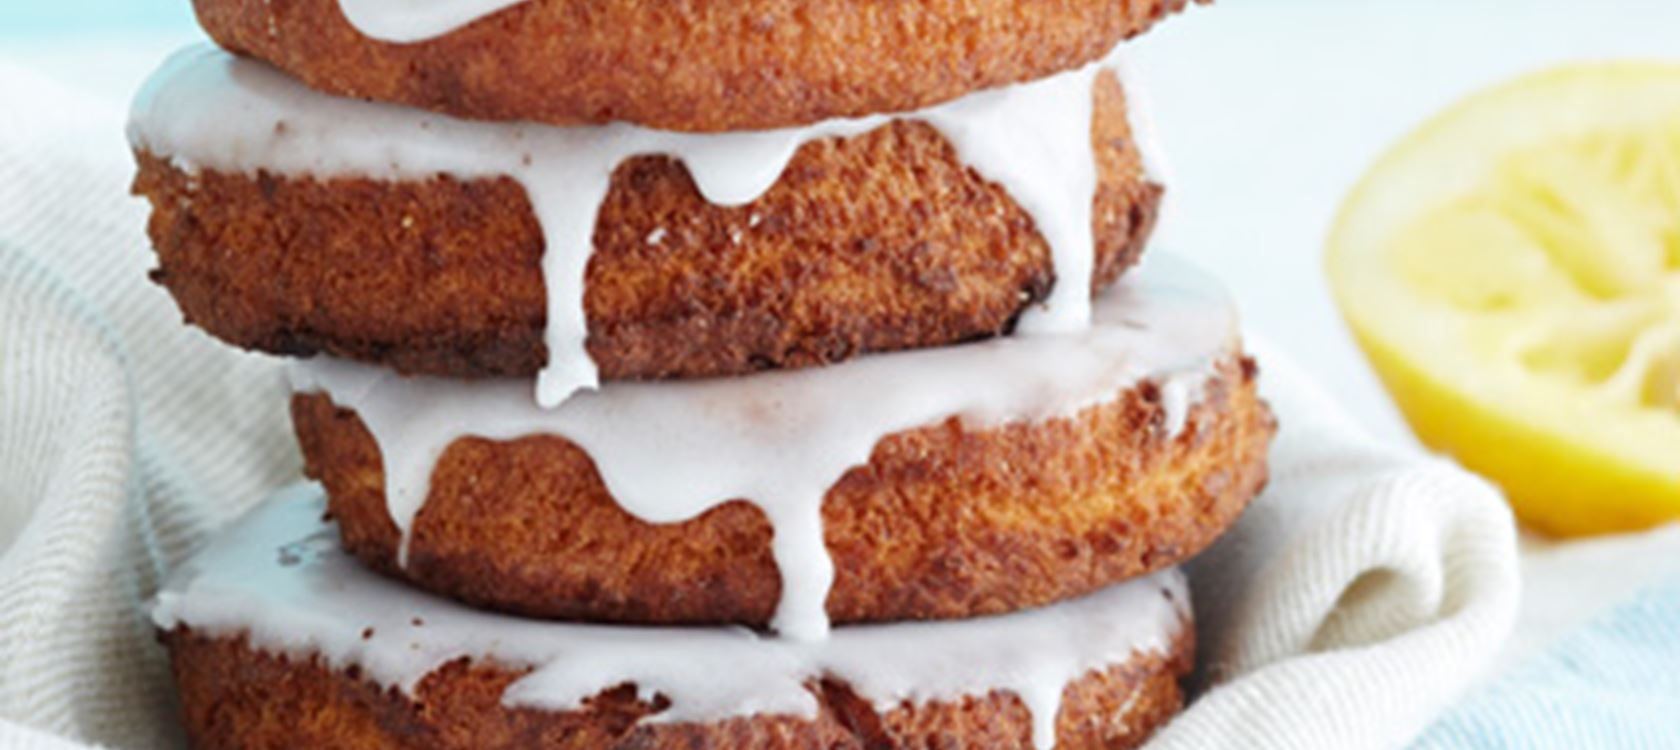 Wanhanajan Crème Fraiche -donitsit